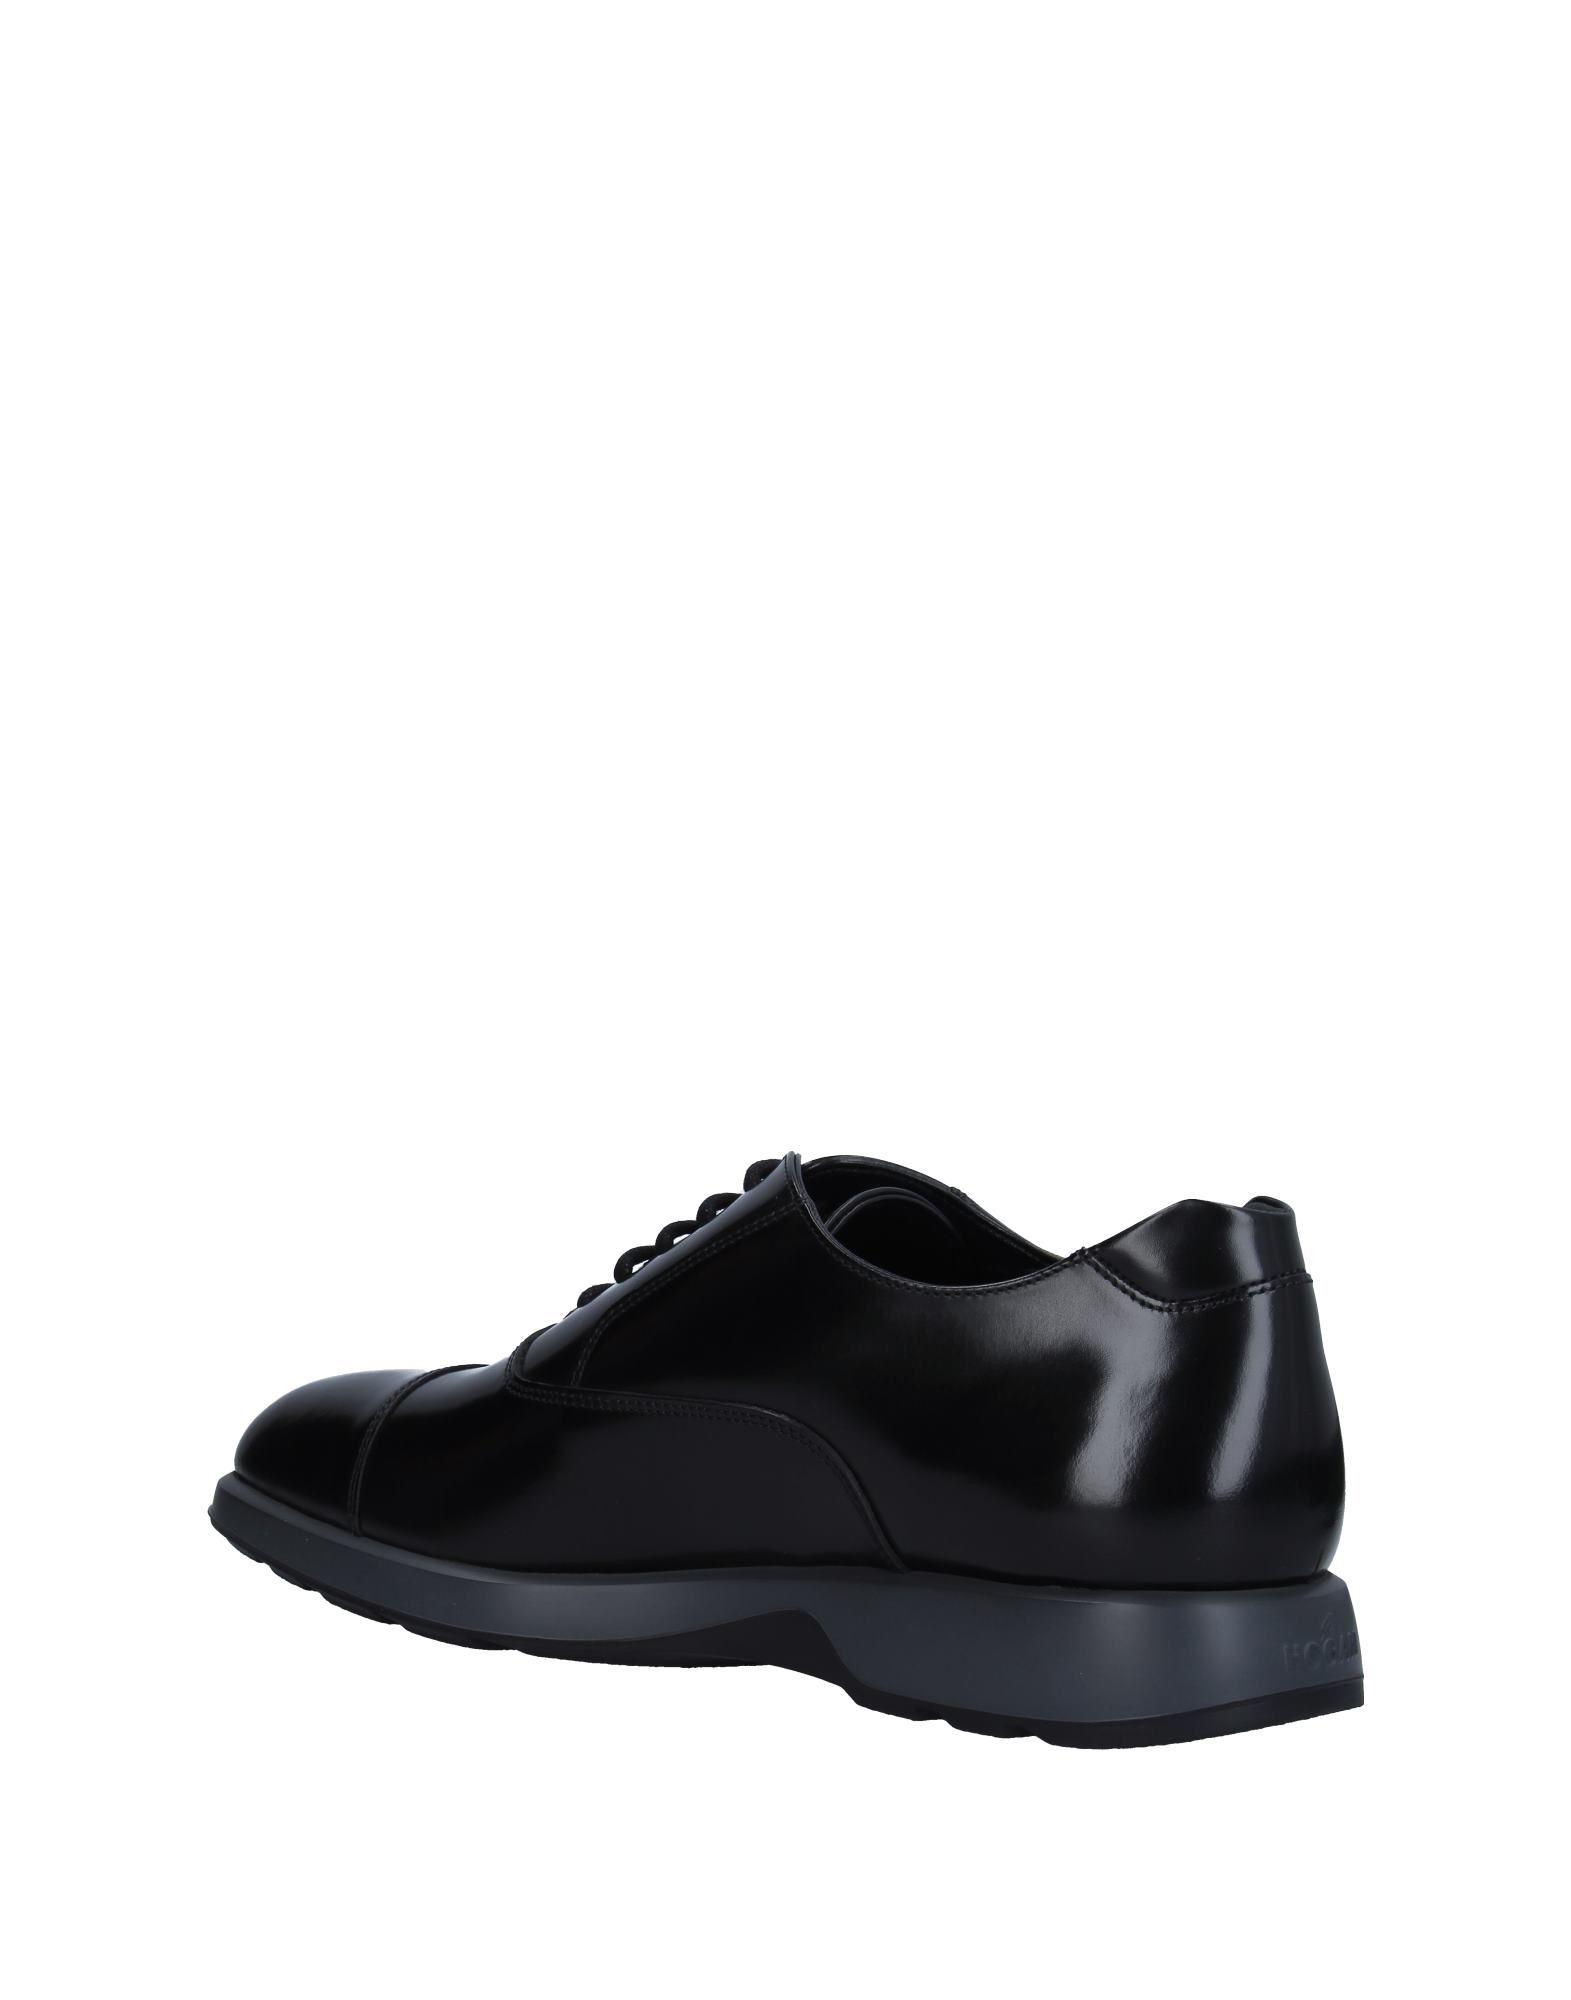 Hogan Schnürschuhe Herren  11299095GA Heiße Schuhe Schuhe Schuhe a9a94b